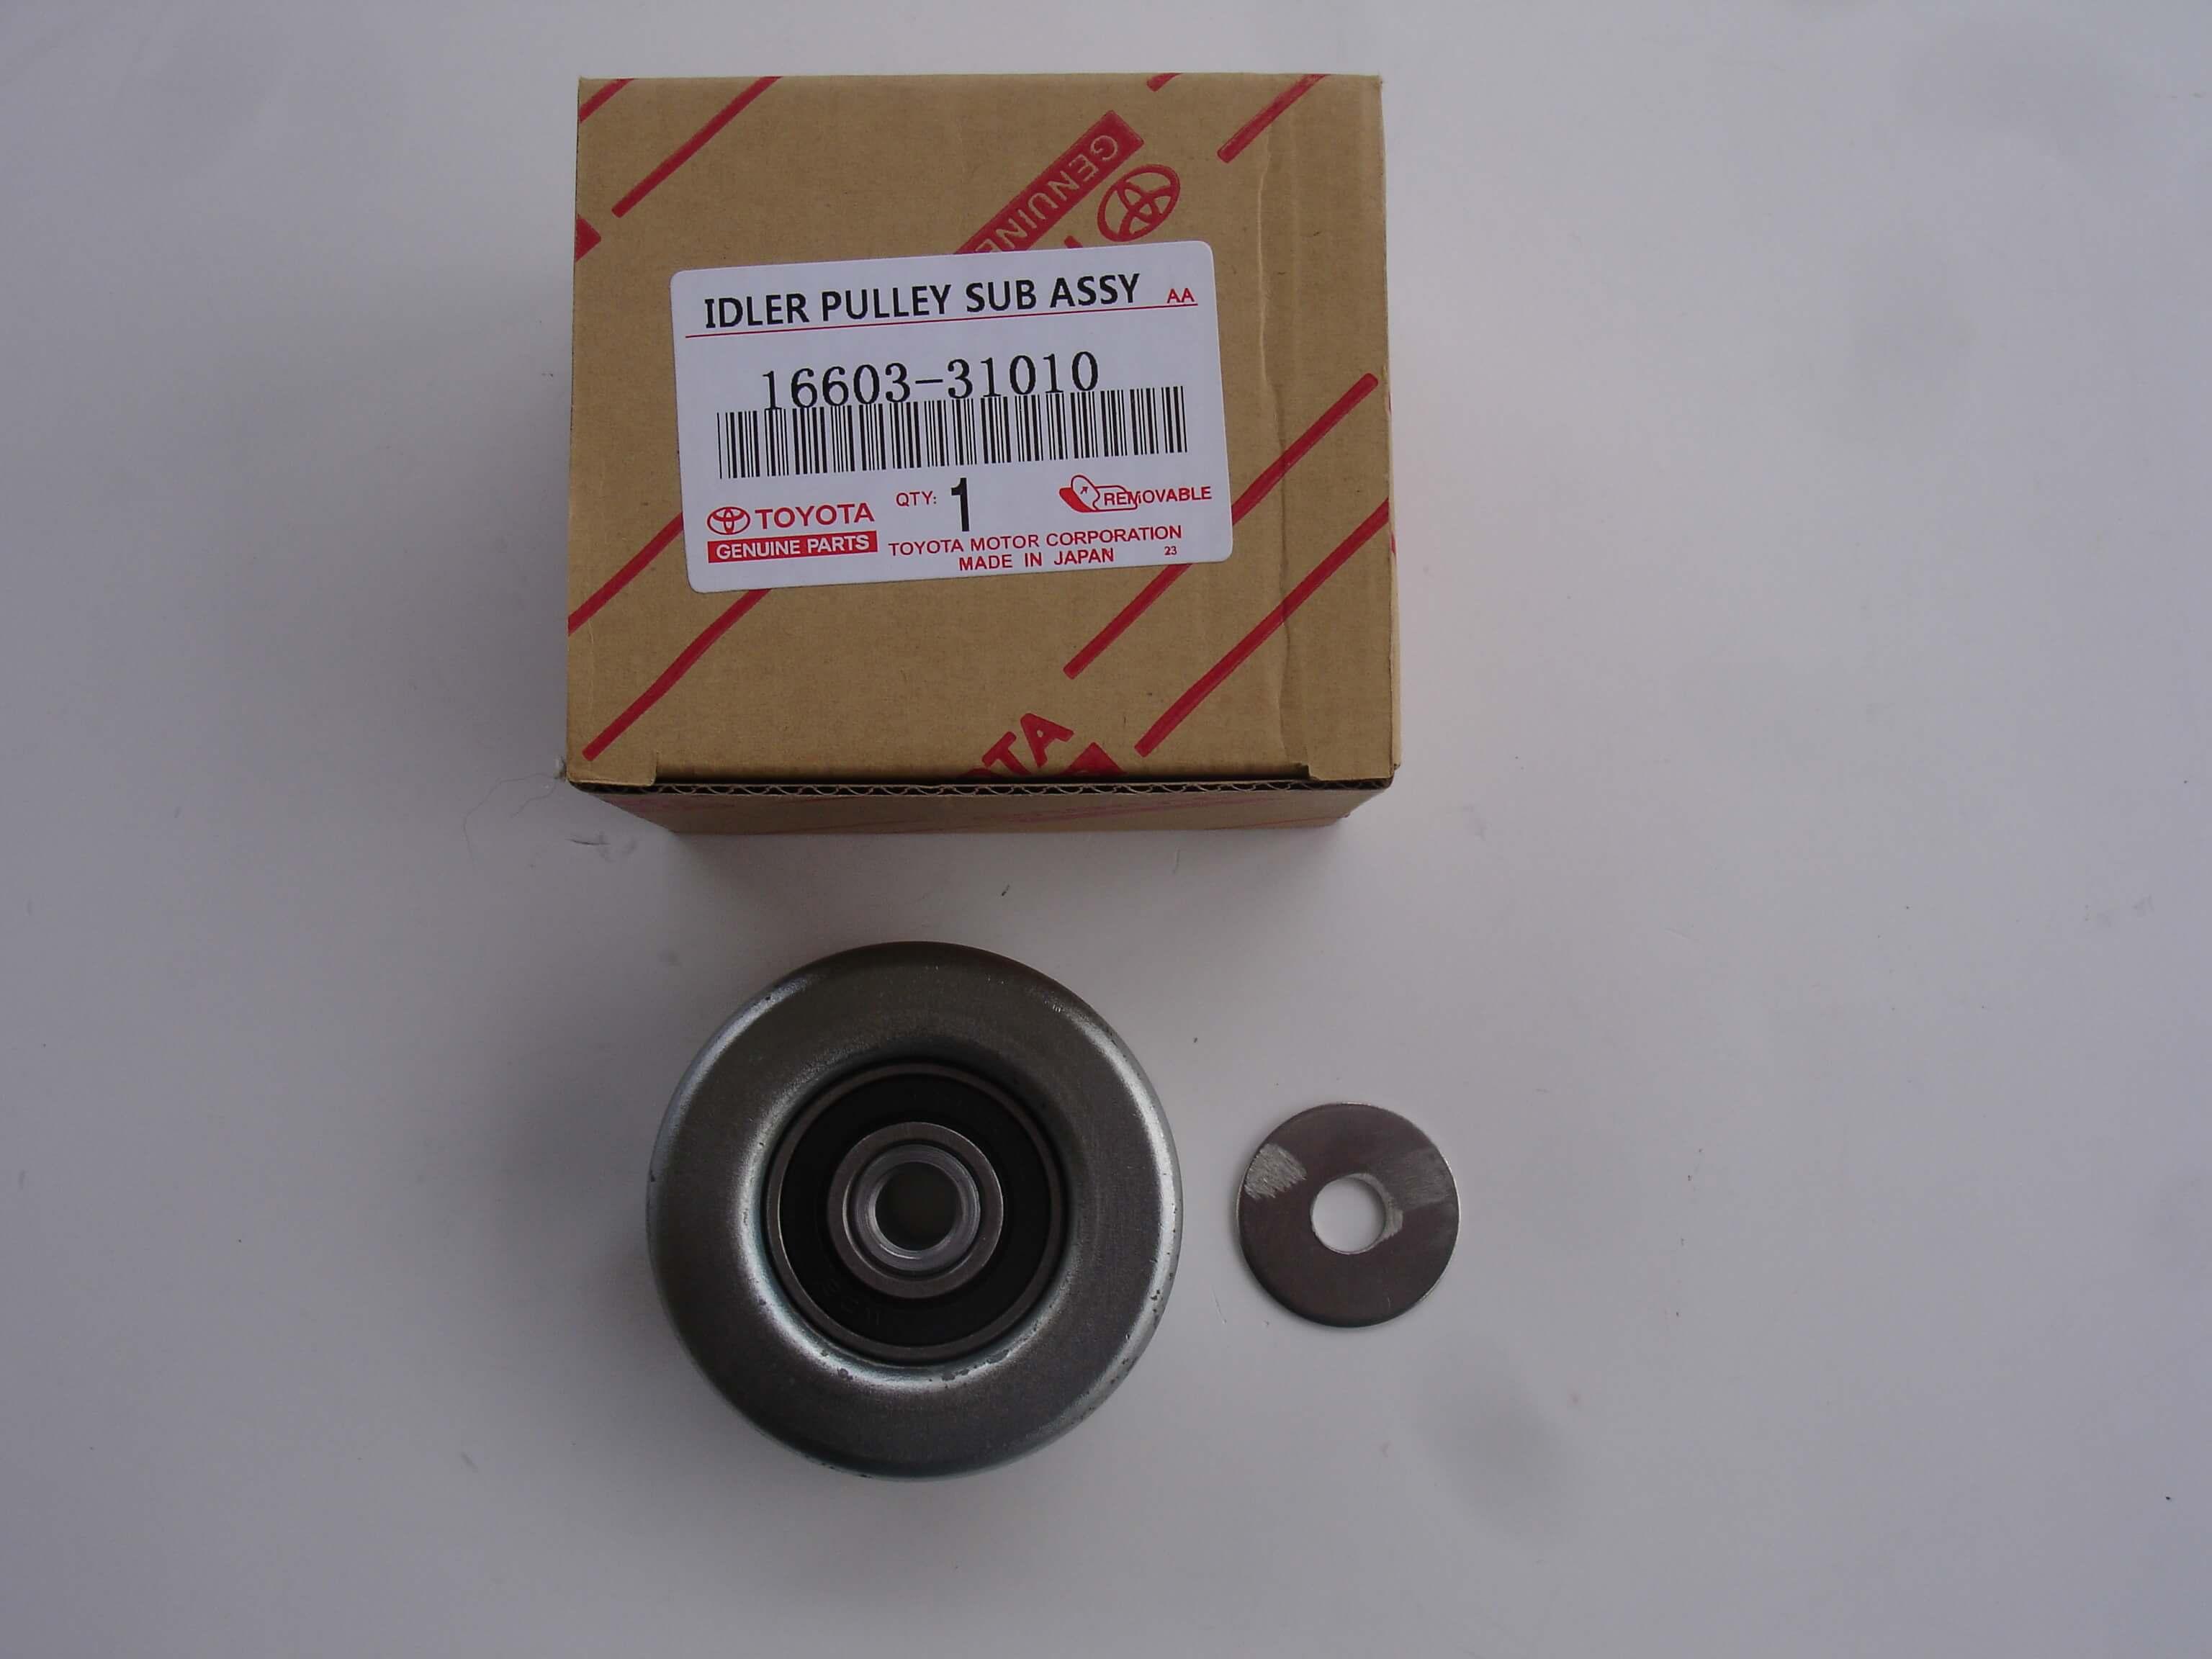 Toyota Lexus OEM 16603-31010 Idler Pulley No.1 16603-31040 Tacoma